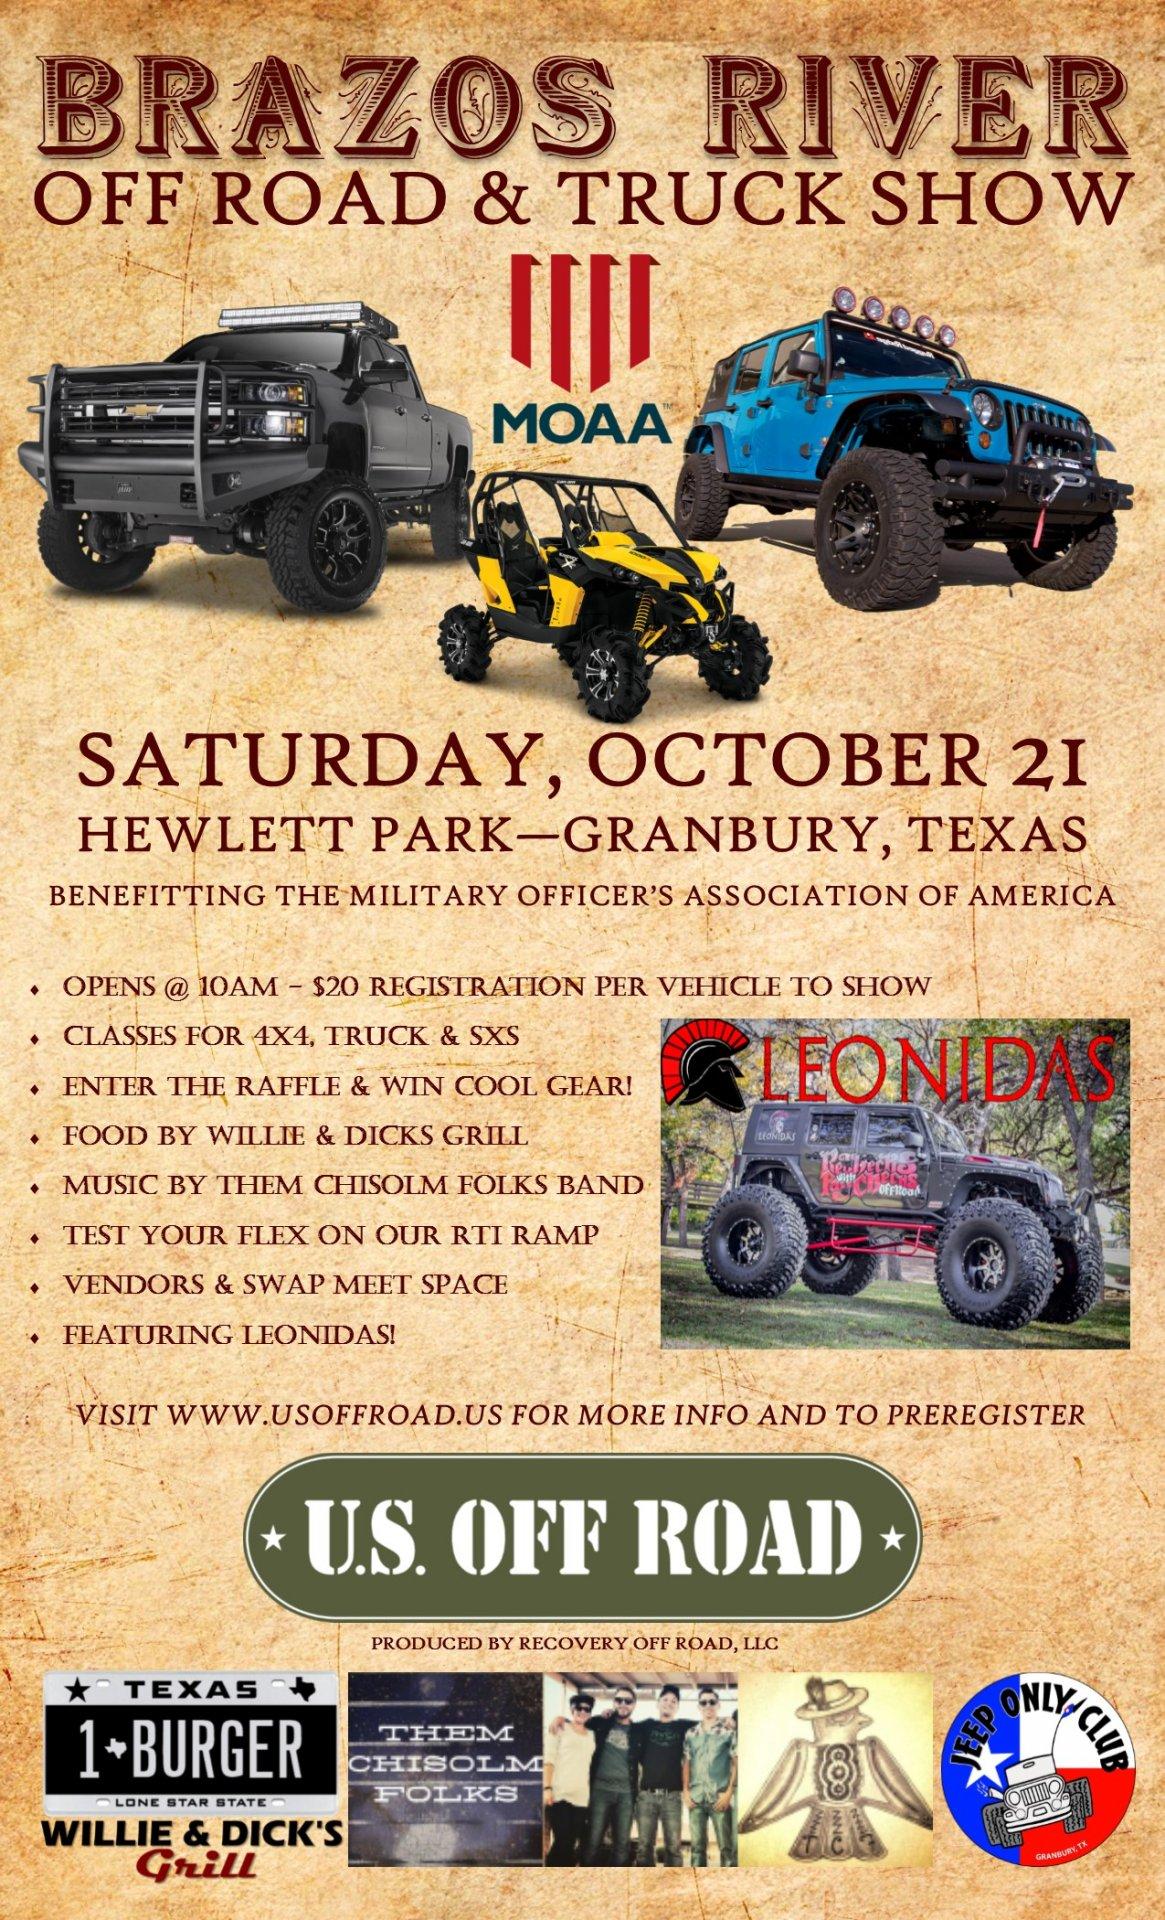 usor truck show flyer.jpg